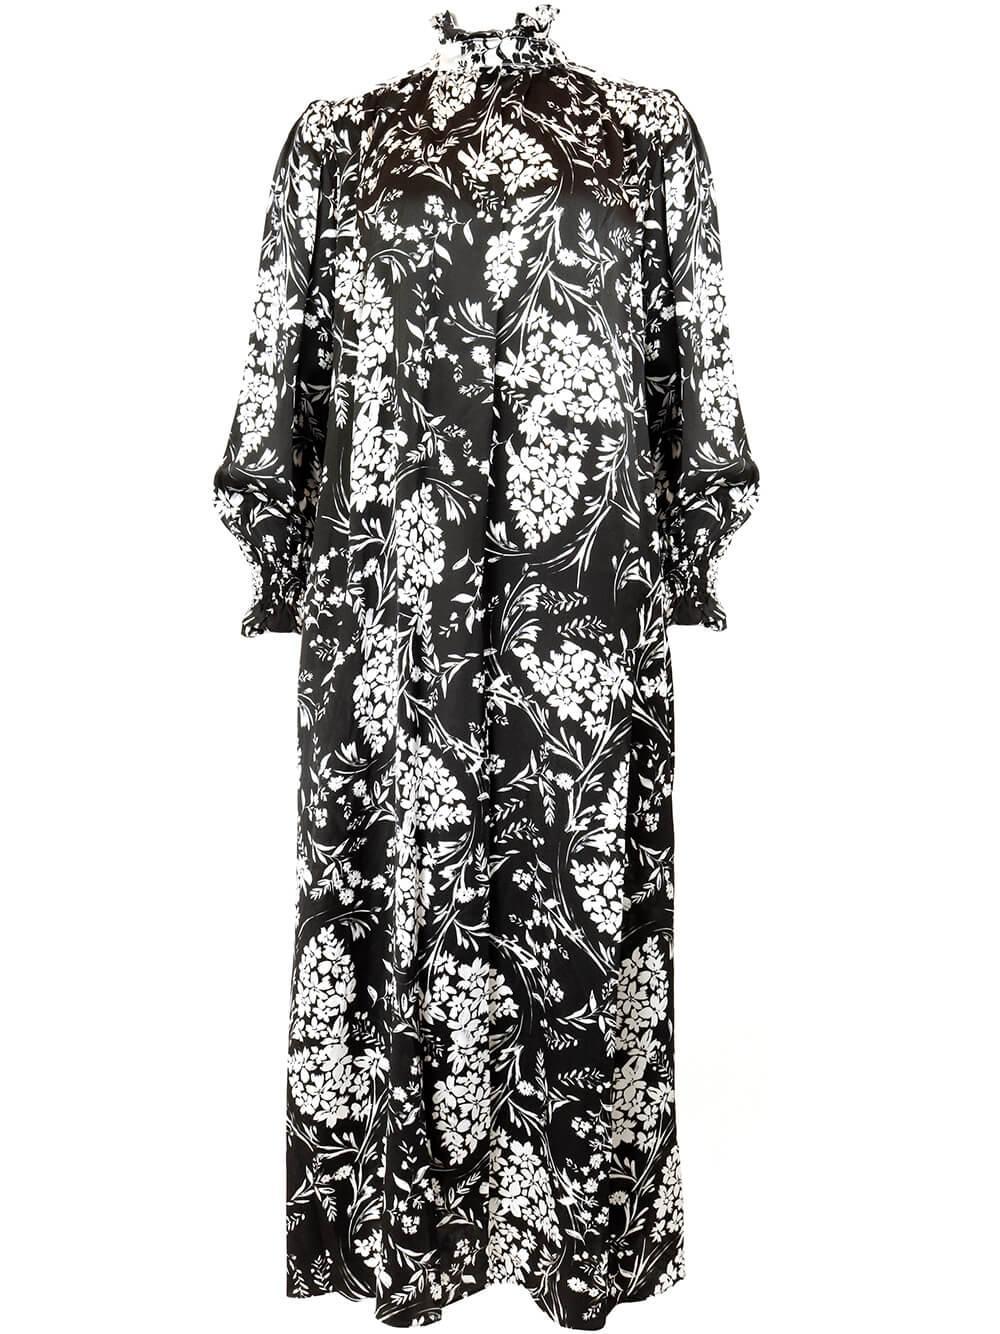 Crosby Maxi Dress